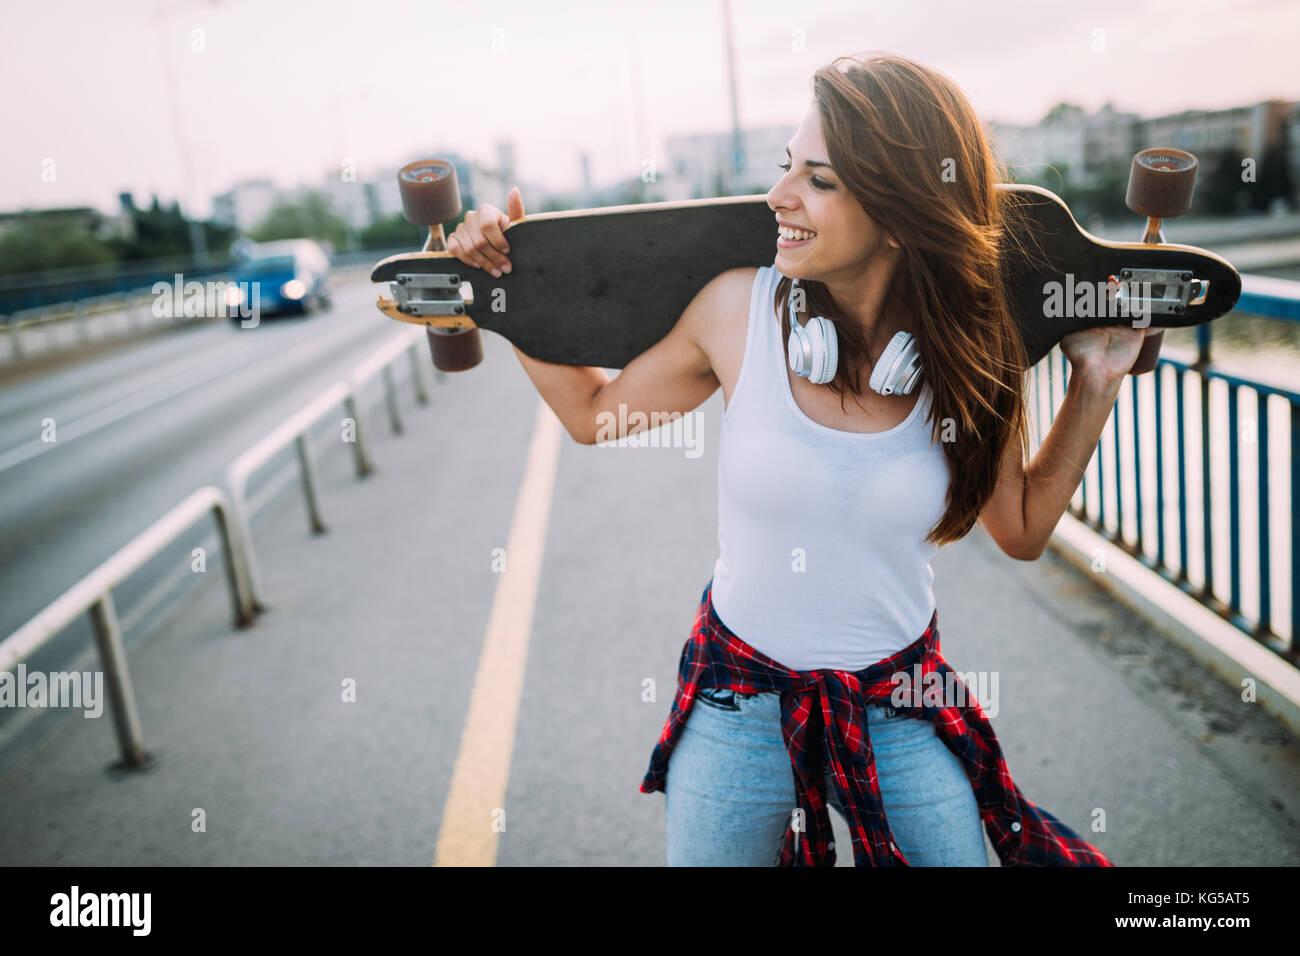 Retrato de hermosa niña sonriente llevando skateboard Imagen De Stock